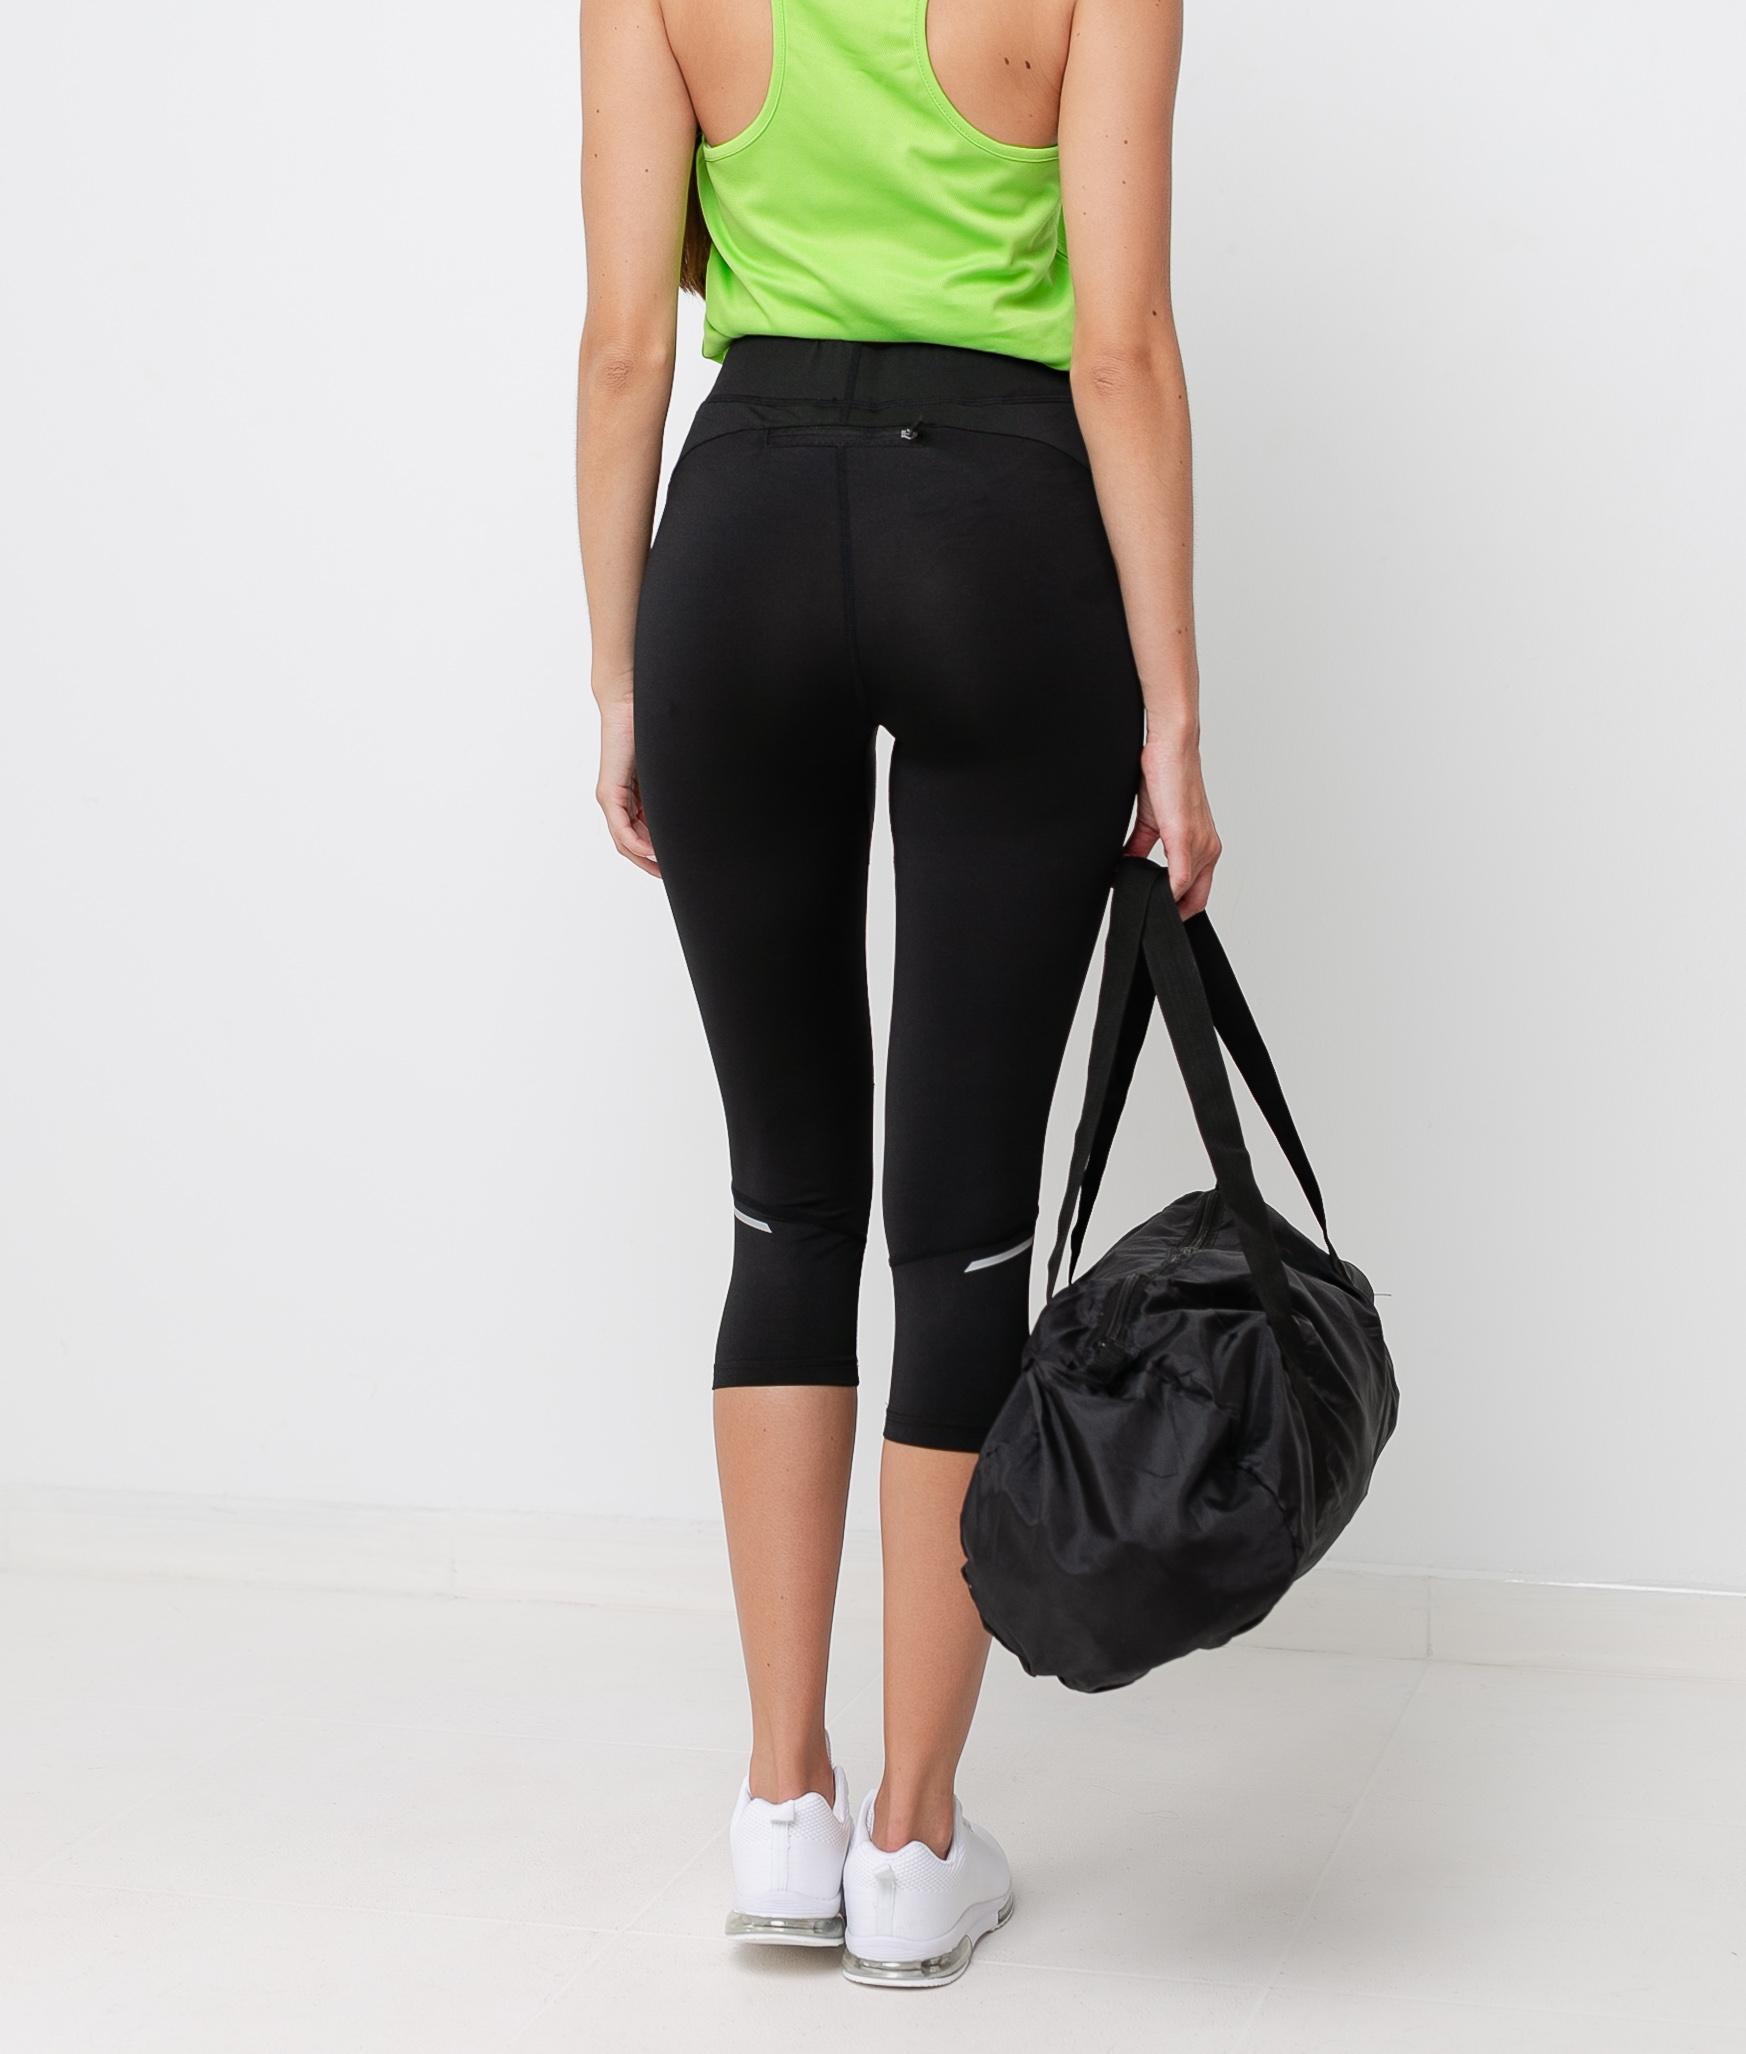 Legging Ridma - Black